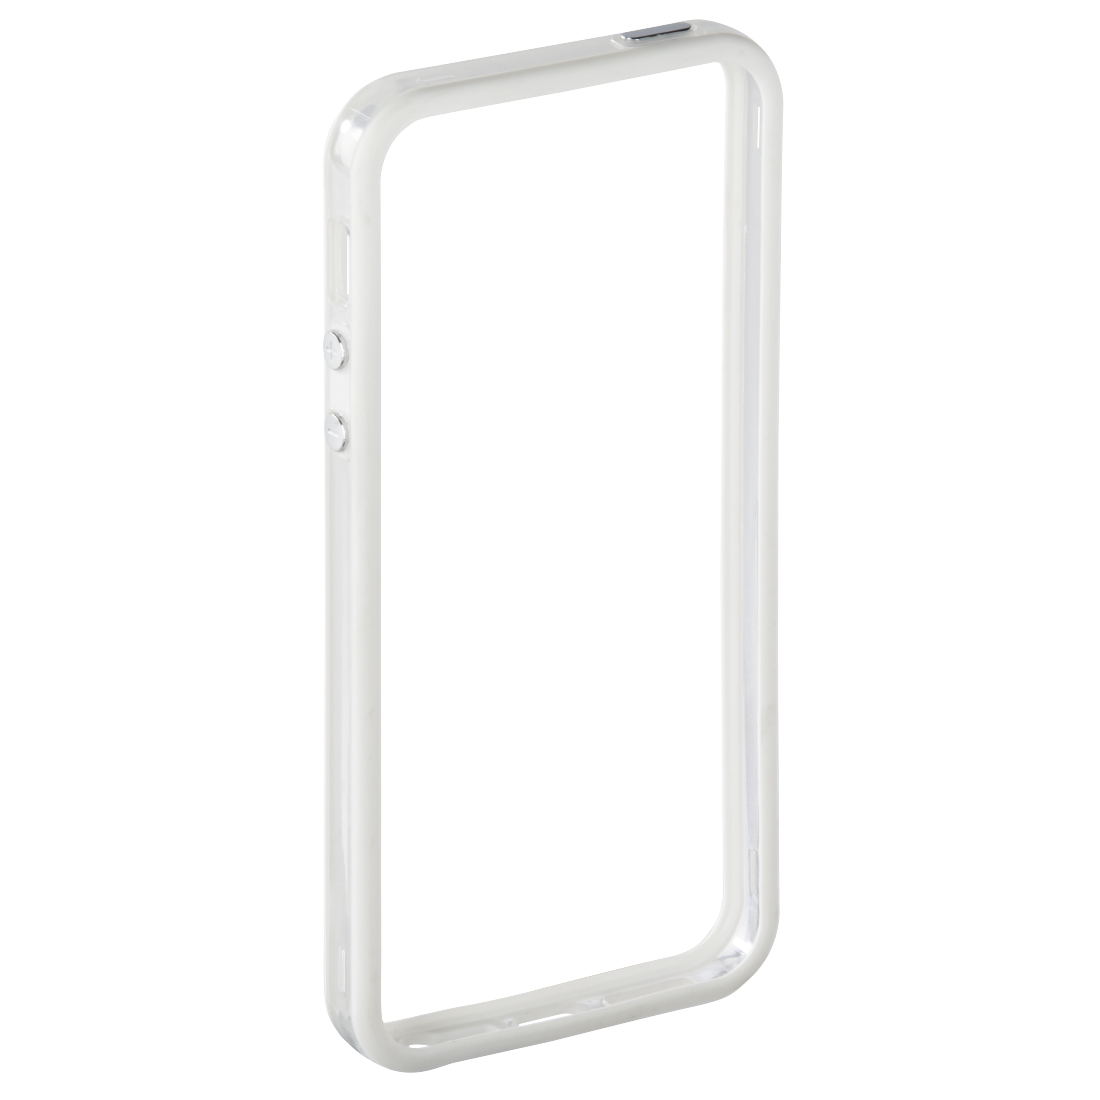 00177453 hama cover edge protector f r apple iphone 5 5s se wei transparent hama de. Black Bedroom Furniture Sets. Home Design Ideas